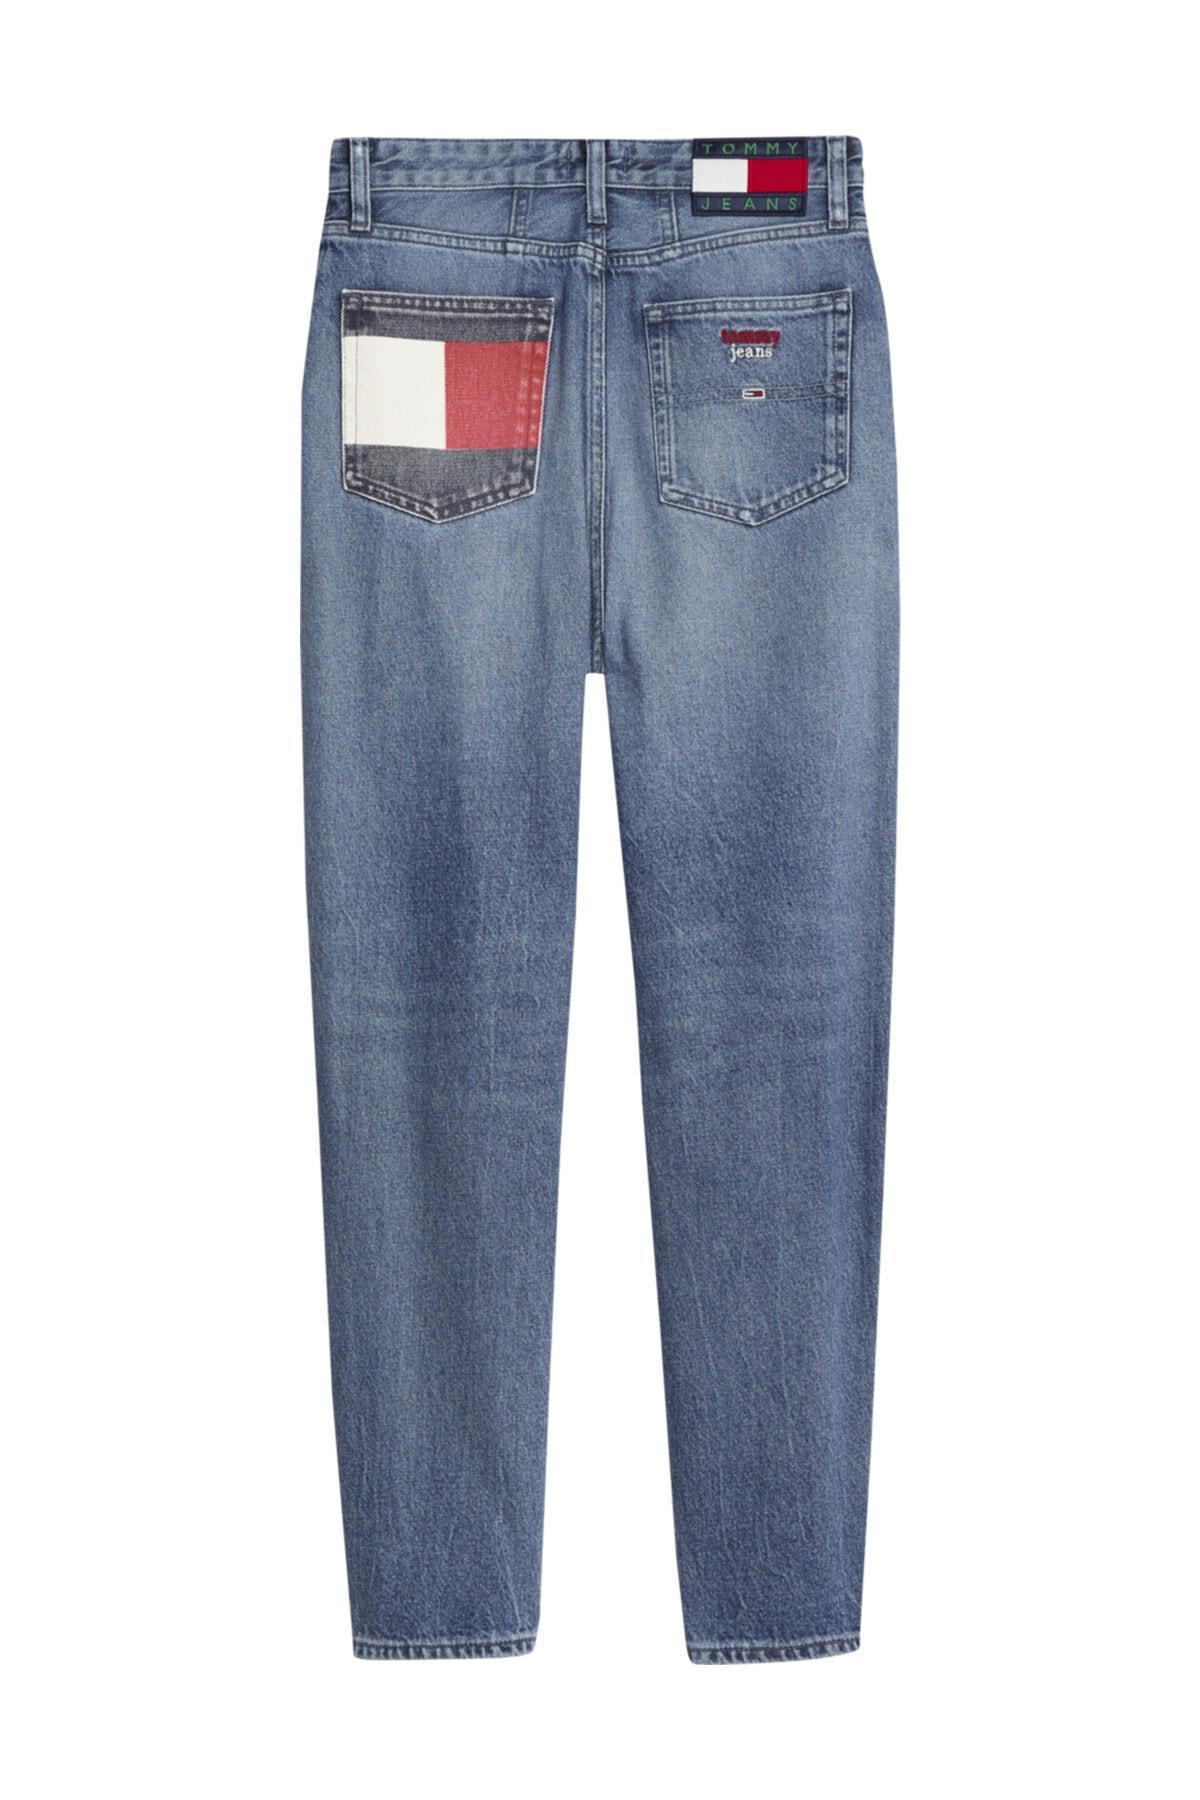 Tommy Hilfiger Kadın Denim Jeans Mom Jean Hr Tprd Btn Fly Svmbr DW0DW08650 2